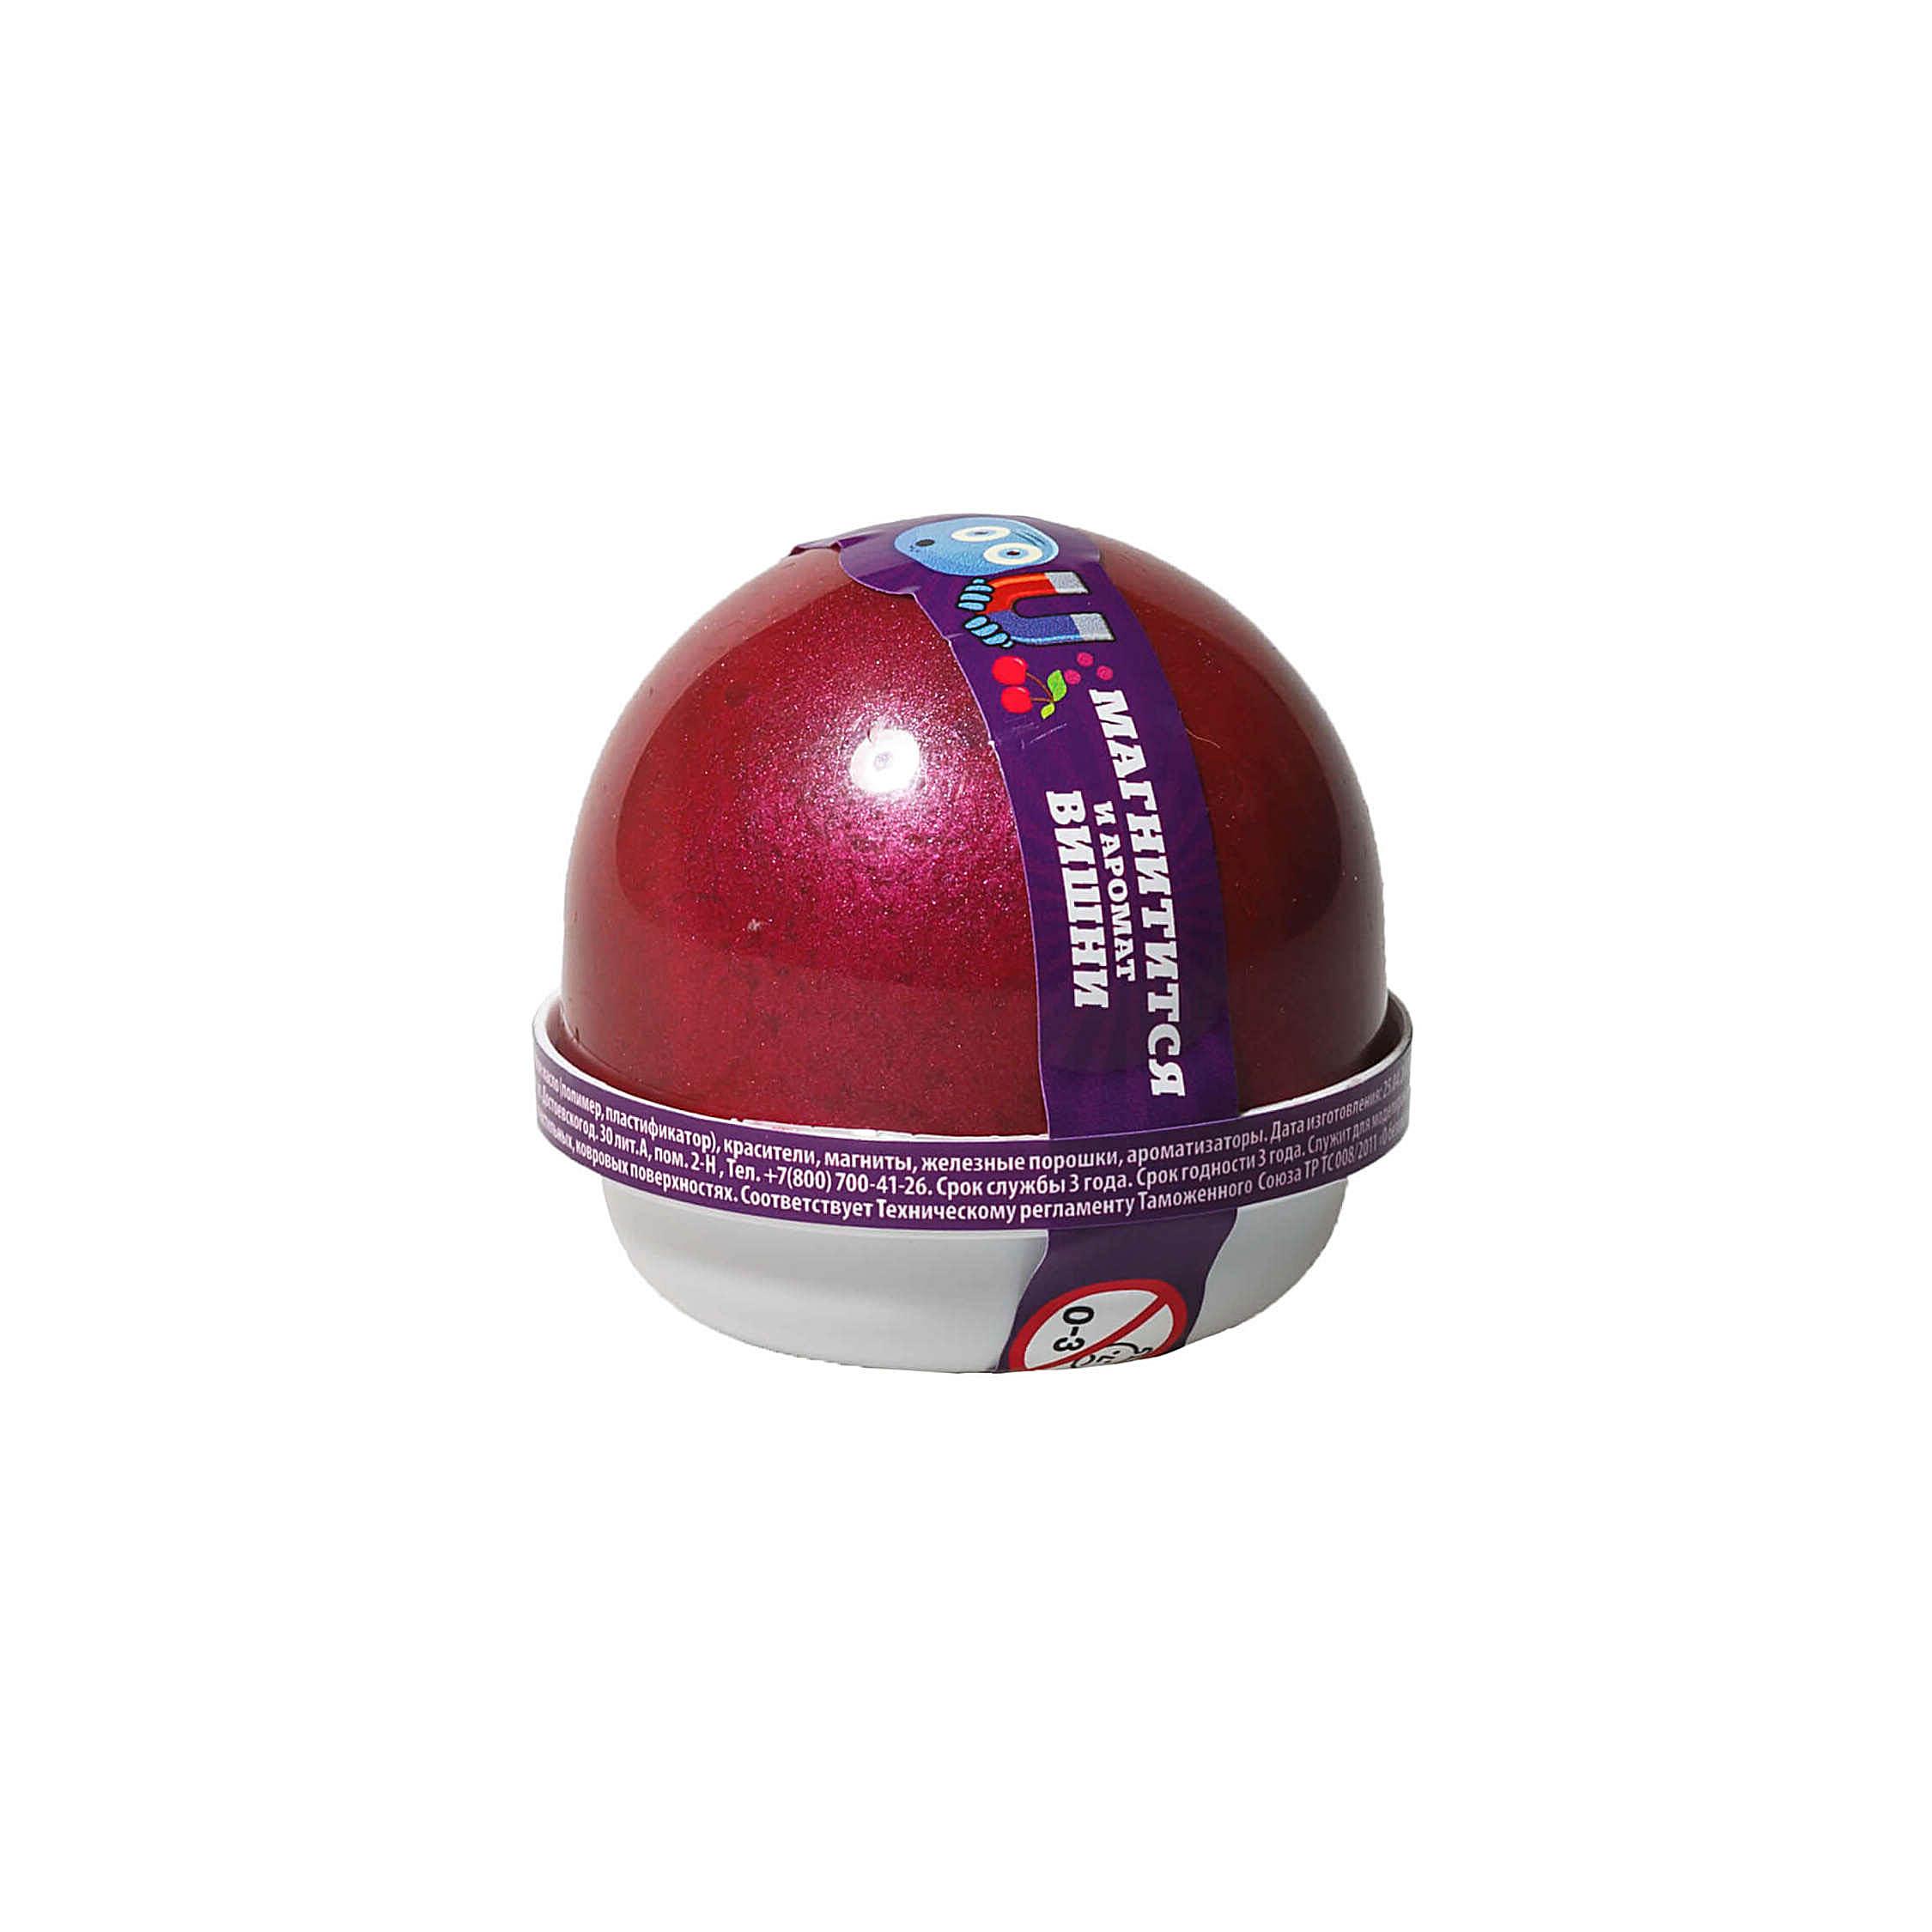 "NGAVM25 ""Жвачка для рук ""Nano gum"", магнитится, с ароматом Вишни"", 25 гр"